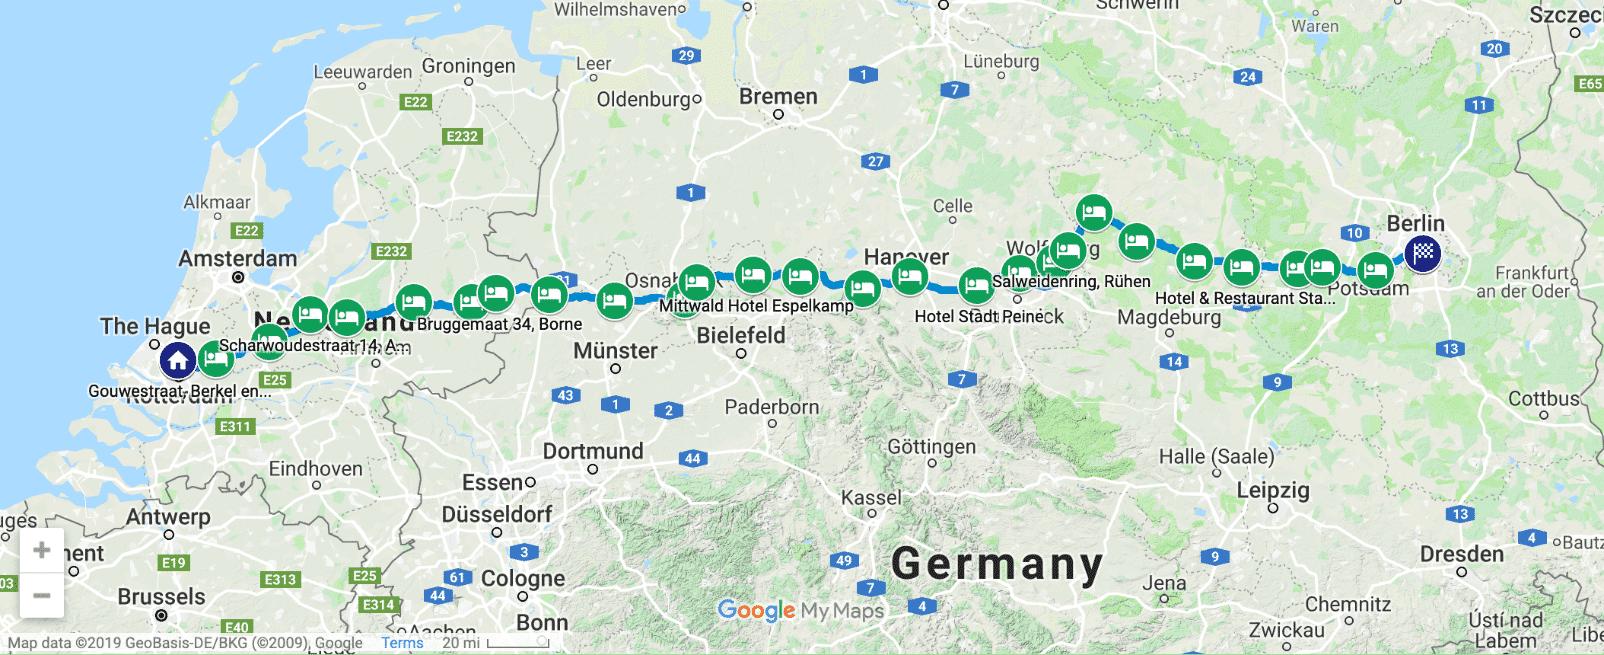 Itinéraire à pied jusqu'au WordCamp Europe